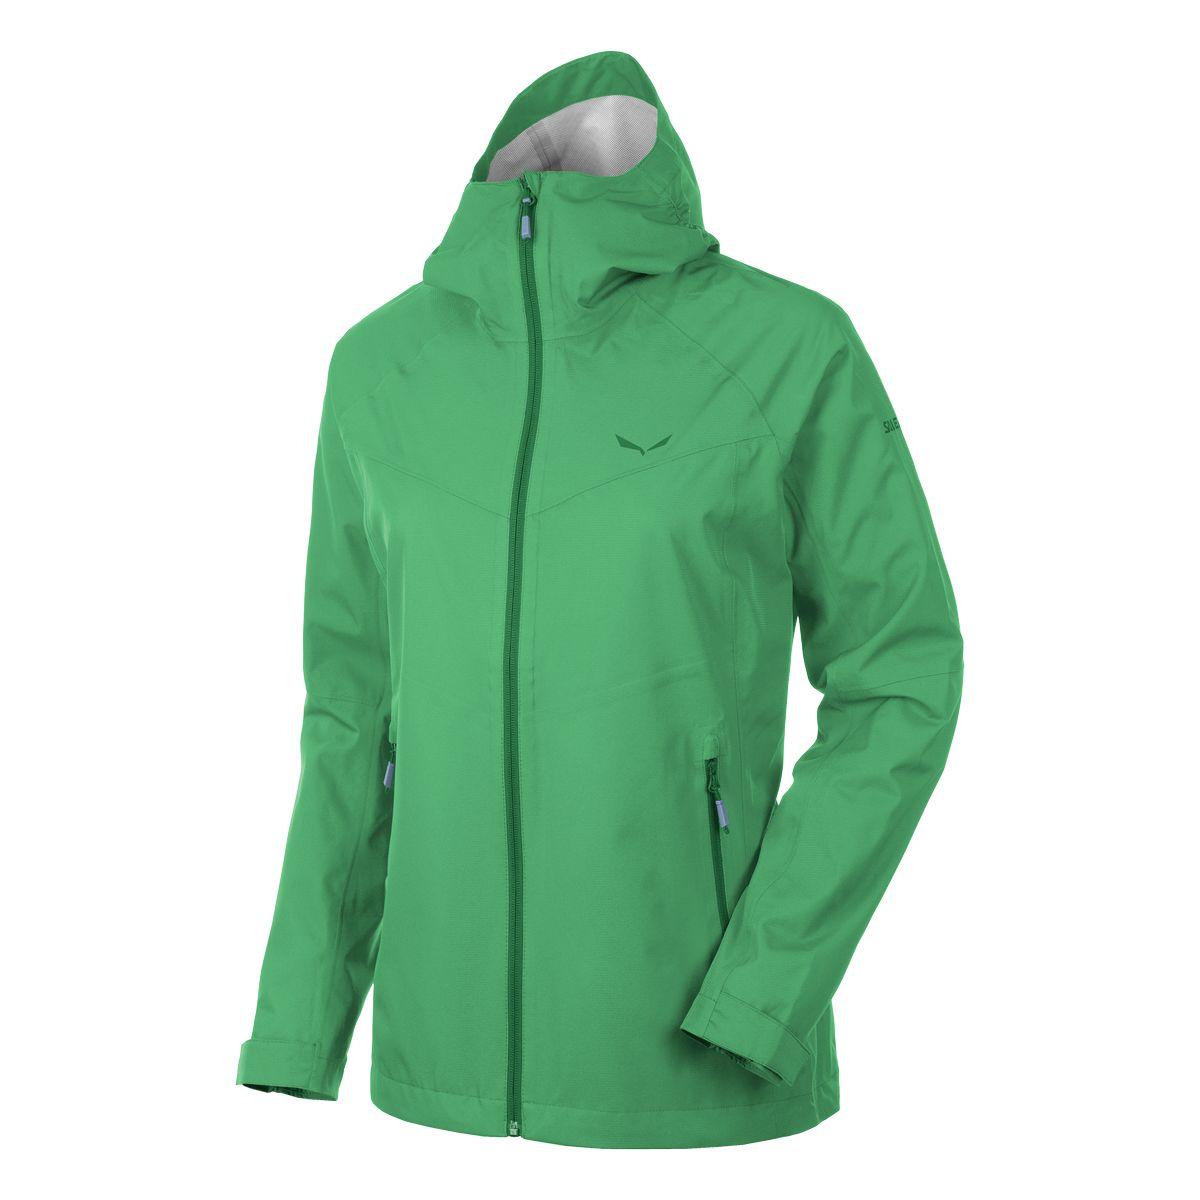 Куртка для активного отдыха Salewa 2016 PUEZ (AQUA 3) PTX W JKT assenzio/5980